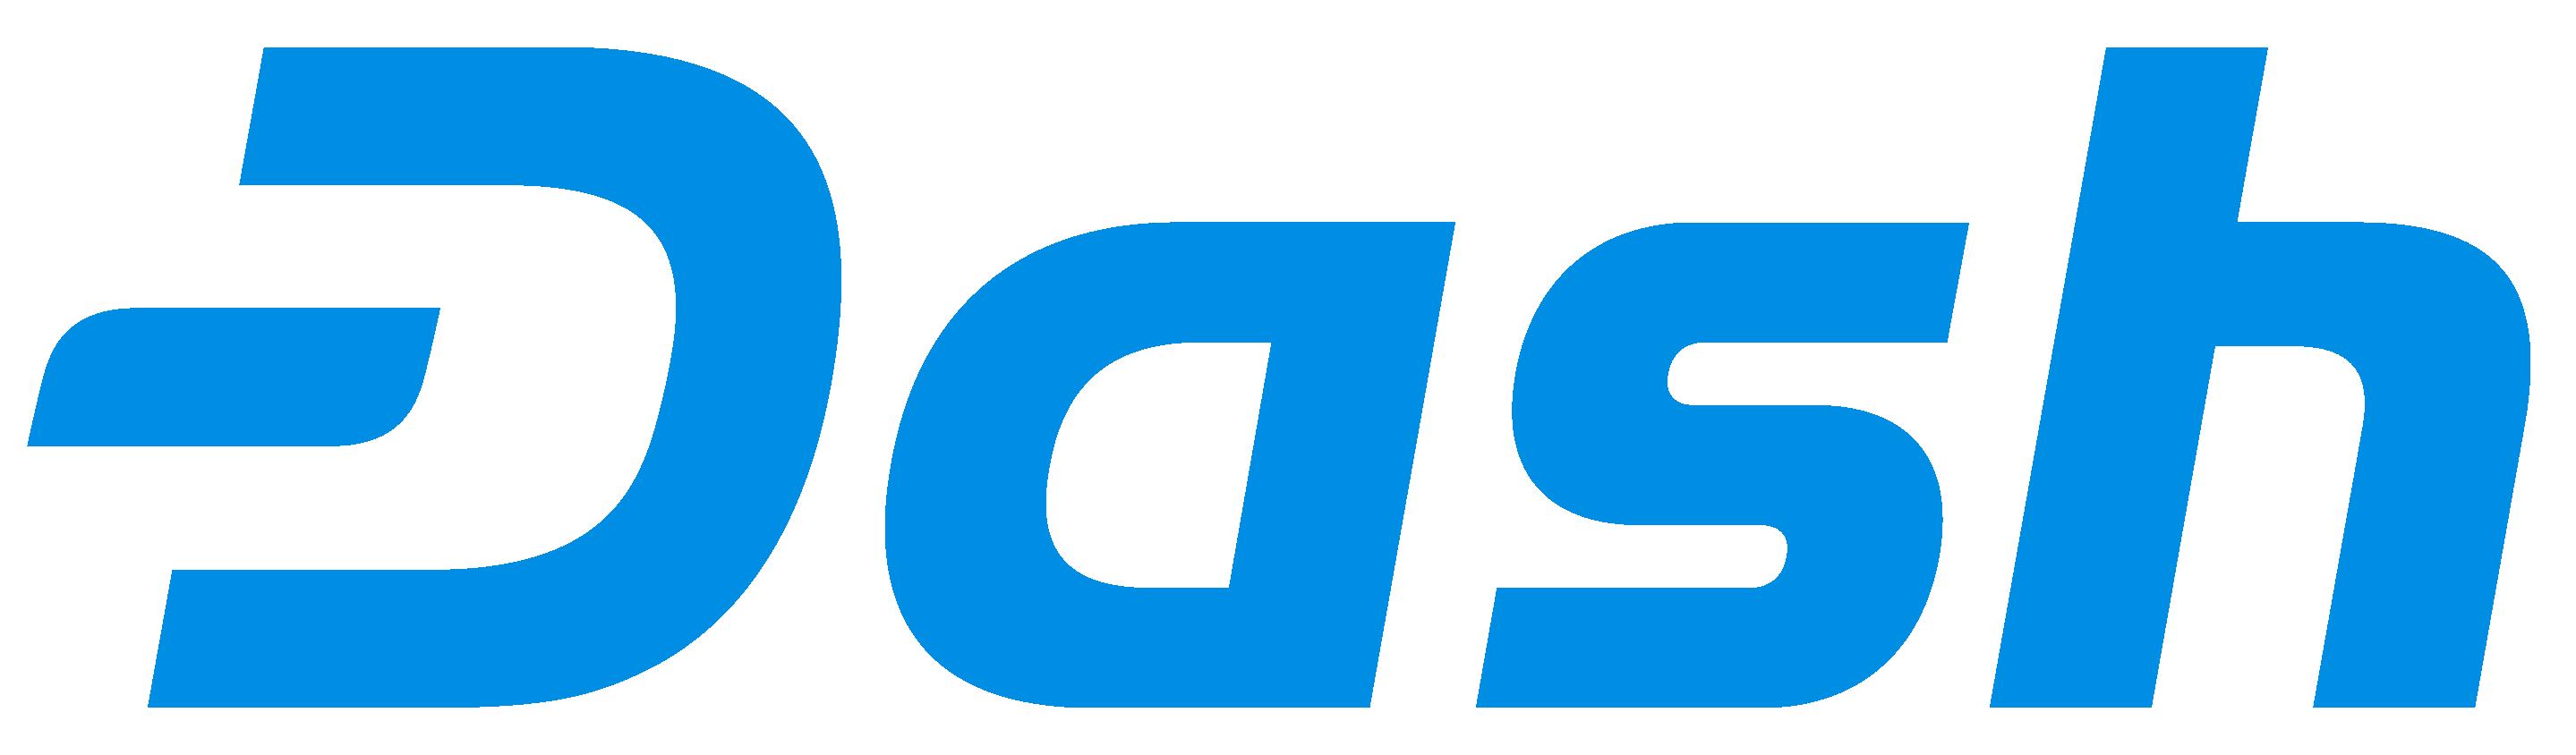 Dash Press Room logo